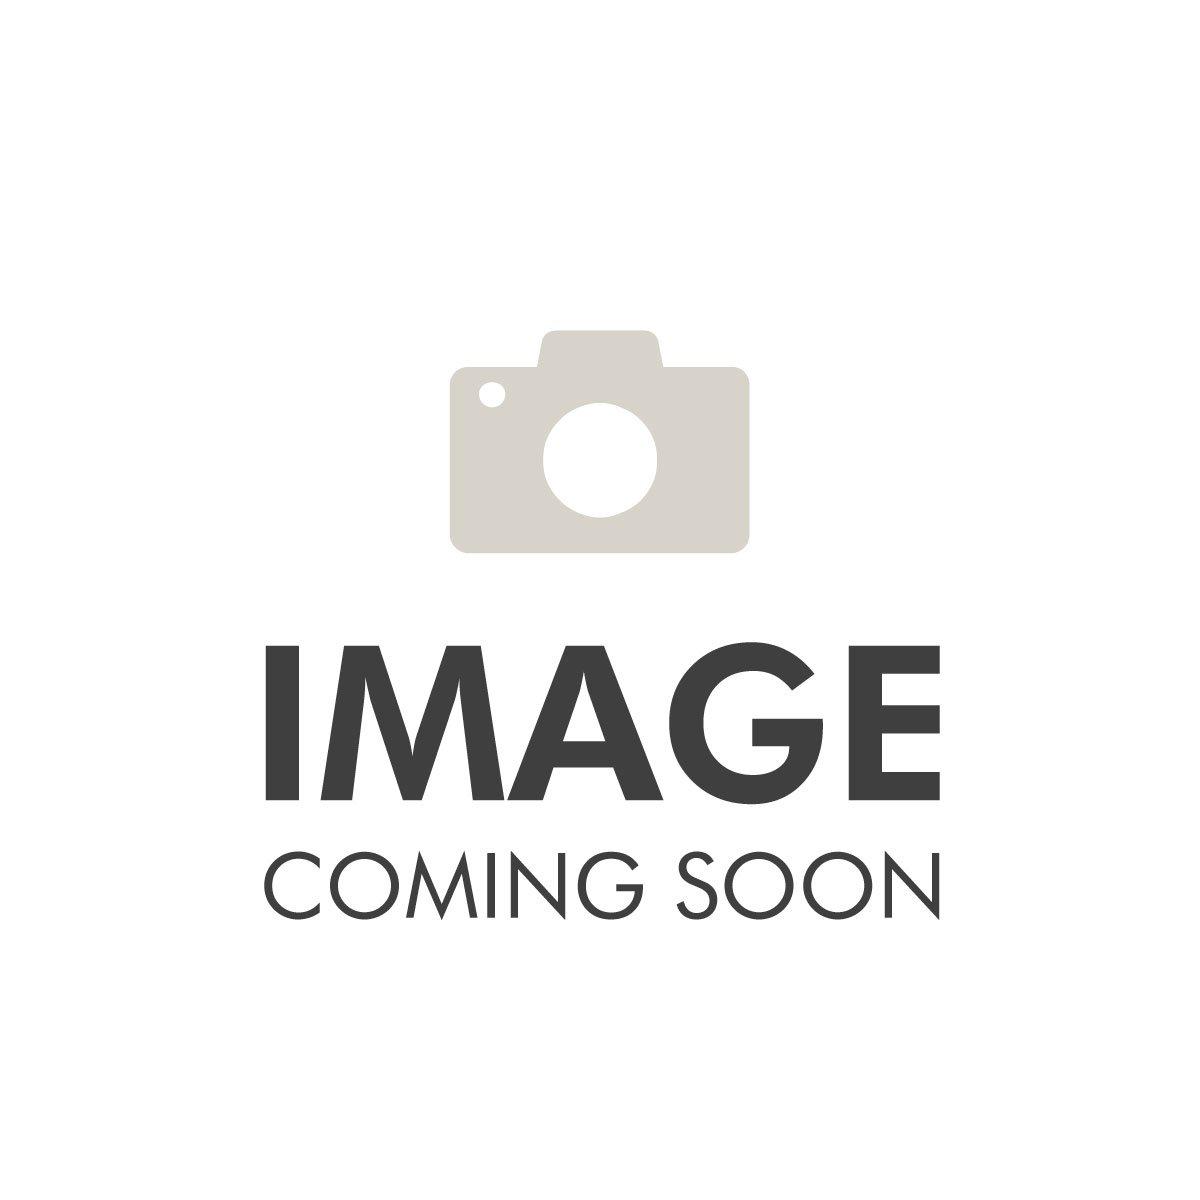 Estee Lauder Mustang Performance Men EDT 100ml Spray